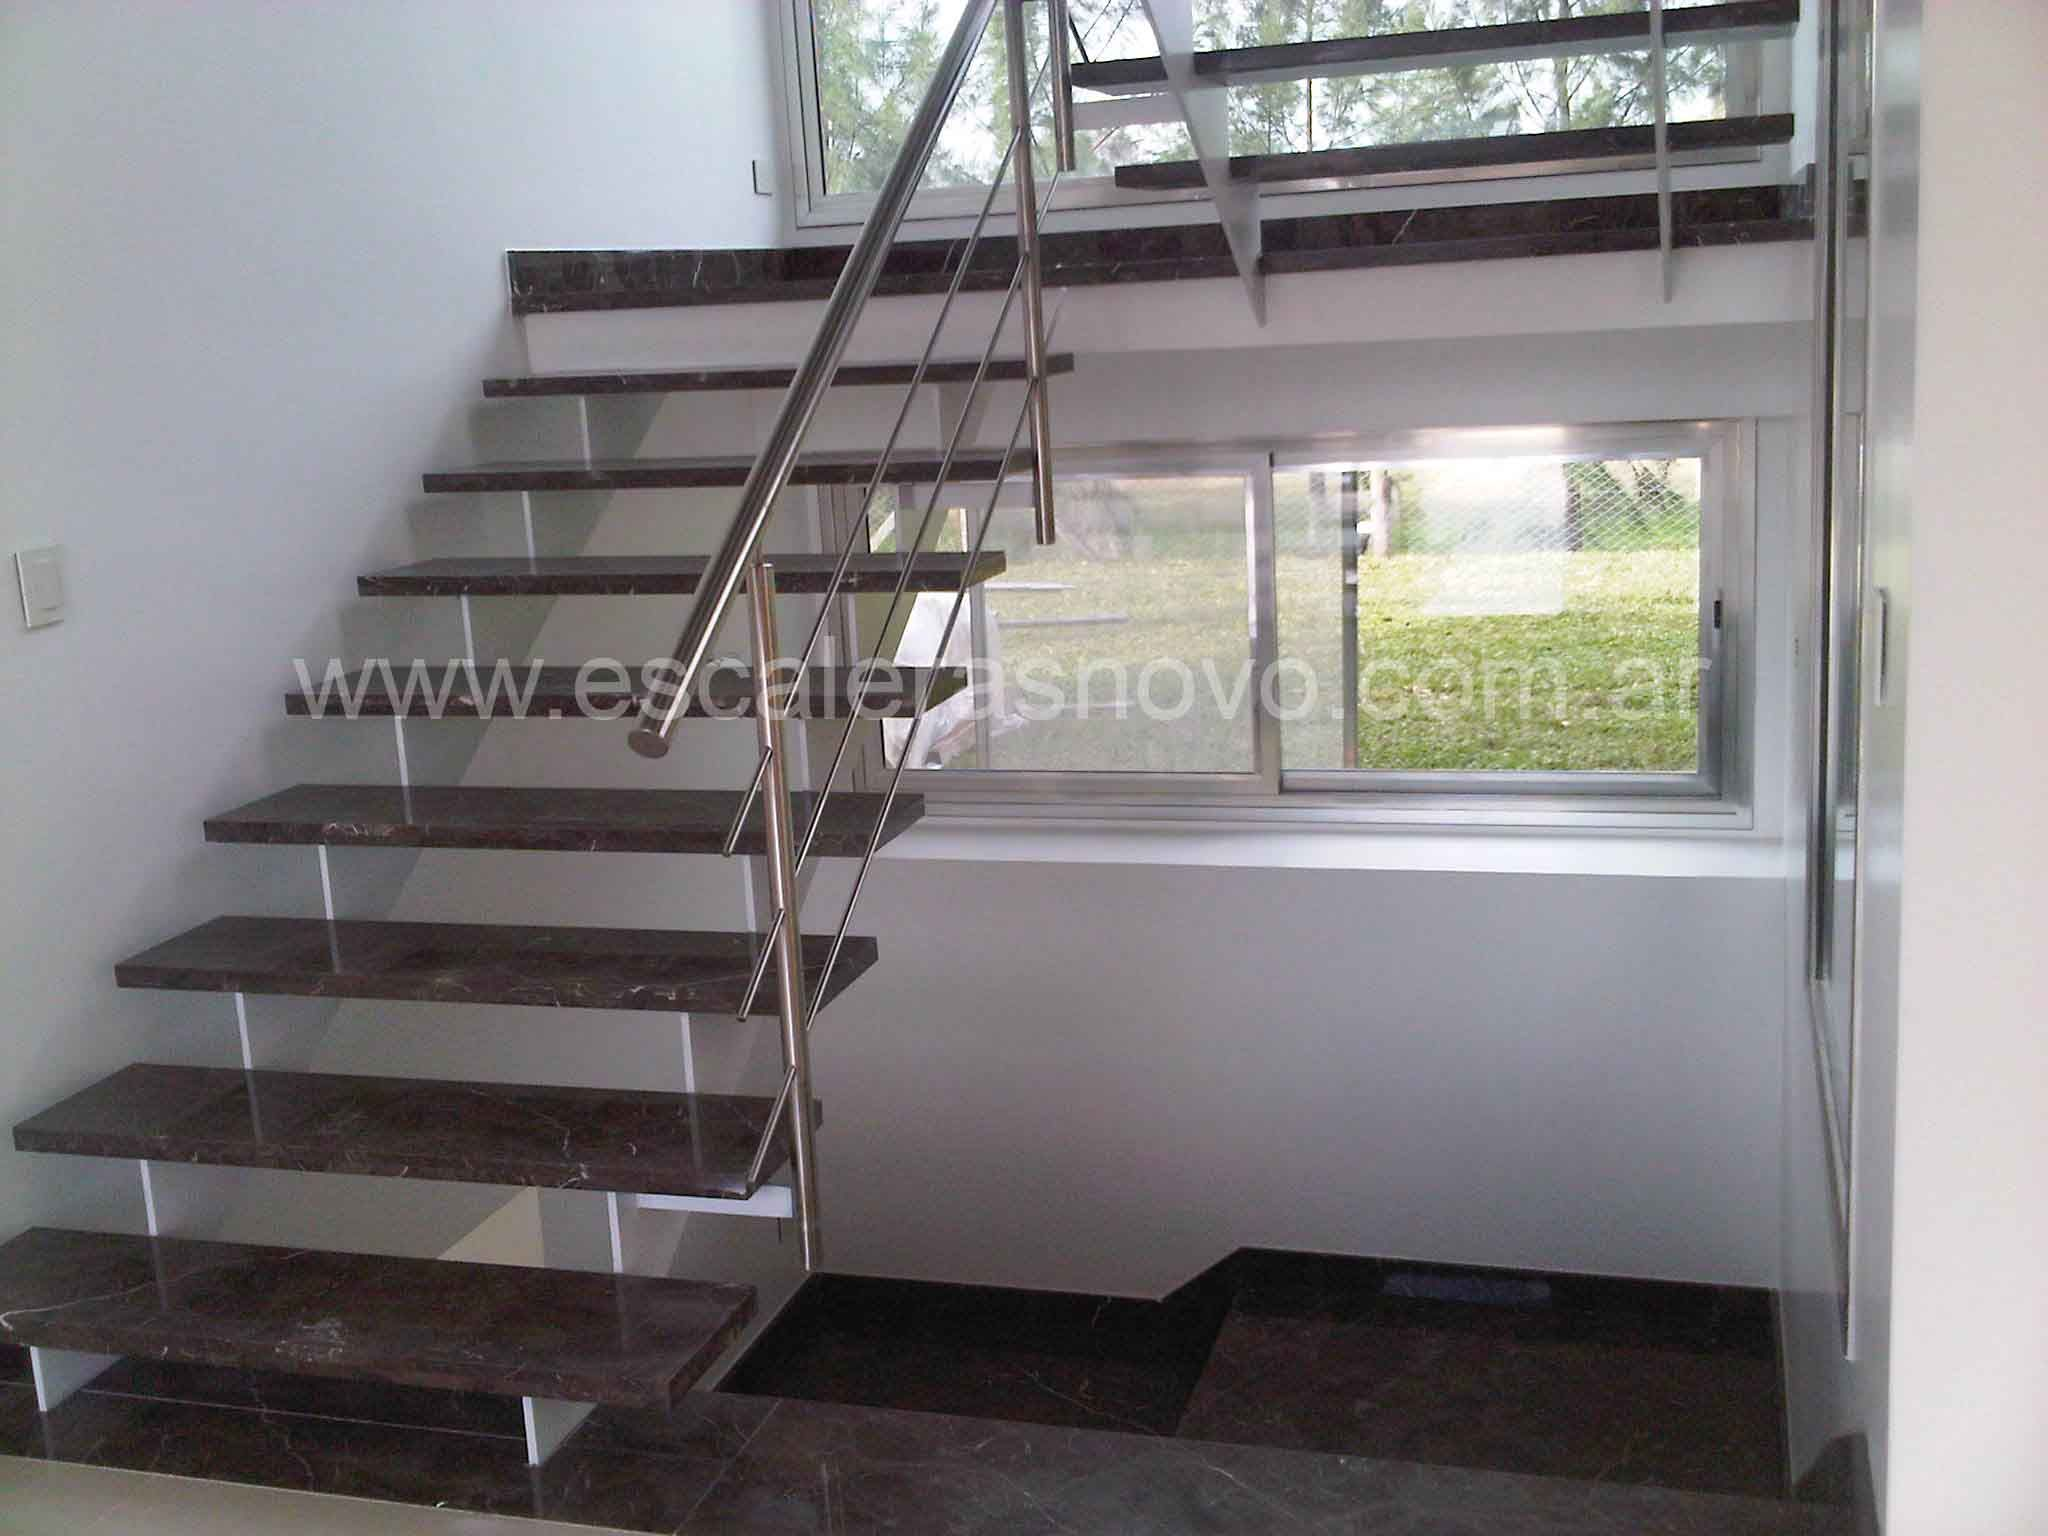 Escalera de marmol con baranda en acero inoxidable for Barandas de escalera